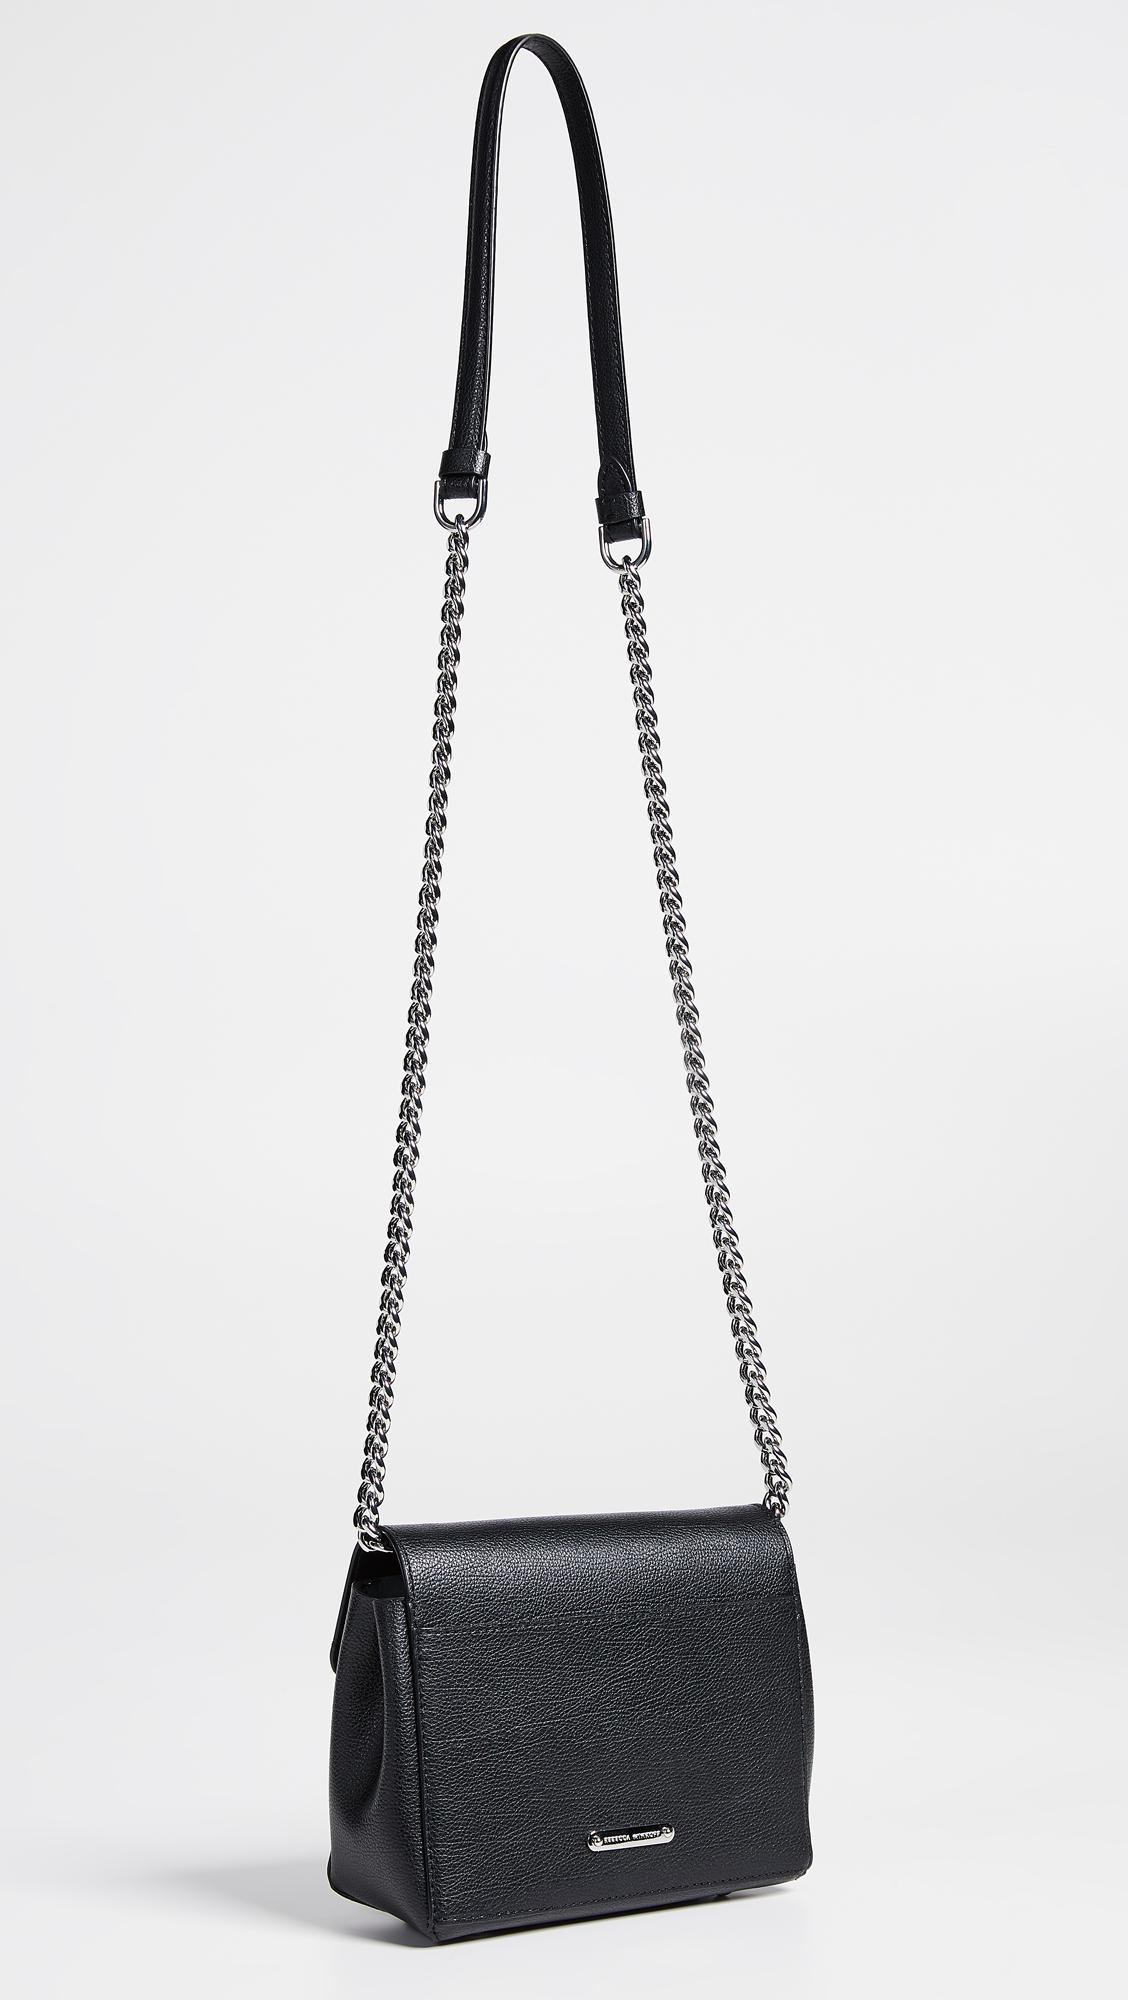 5c3fde4cc54e7 Rebecca Minkoff Stella Cross Body Bag in Black - Lyst